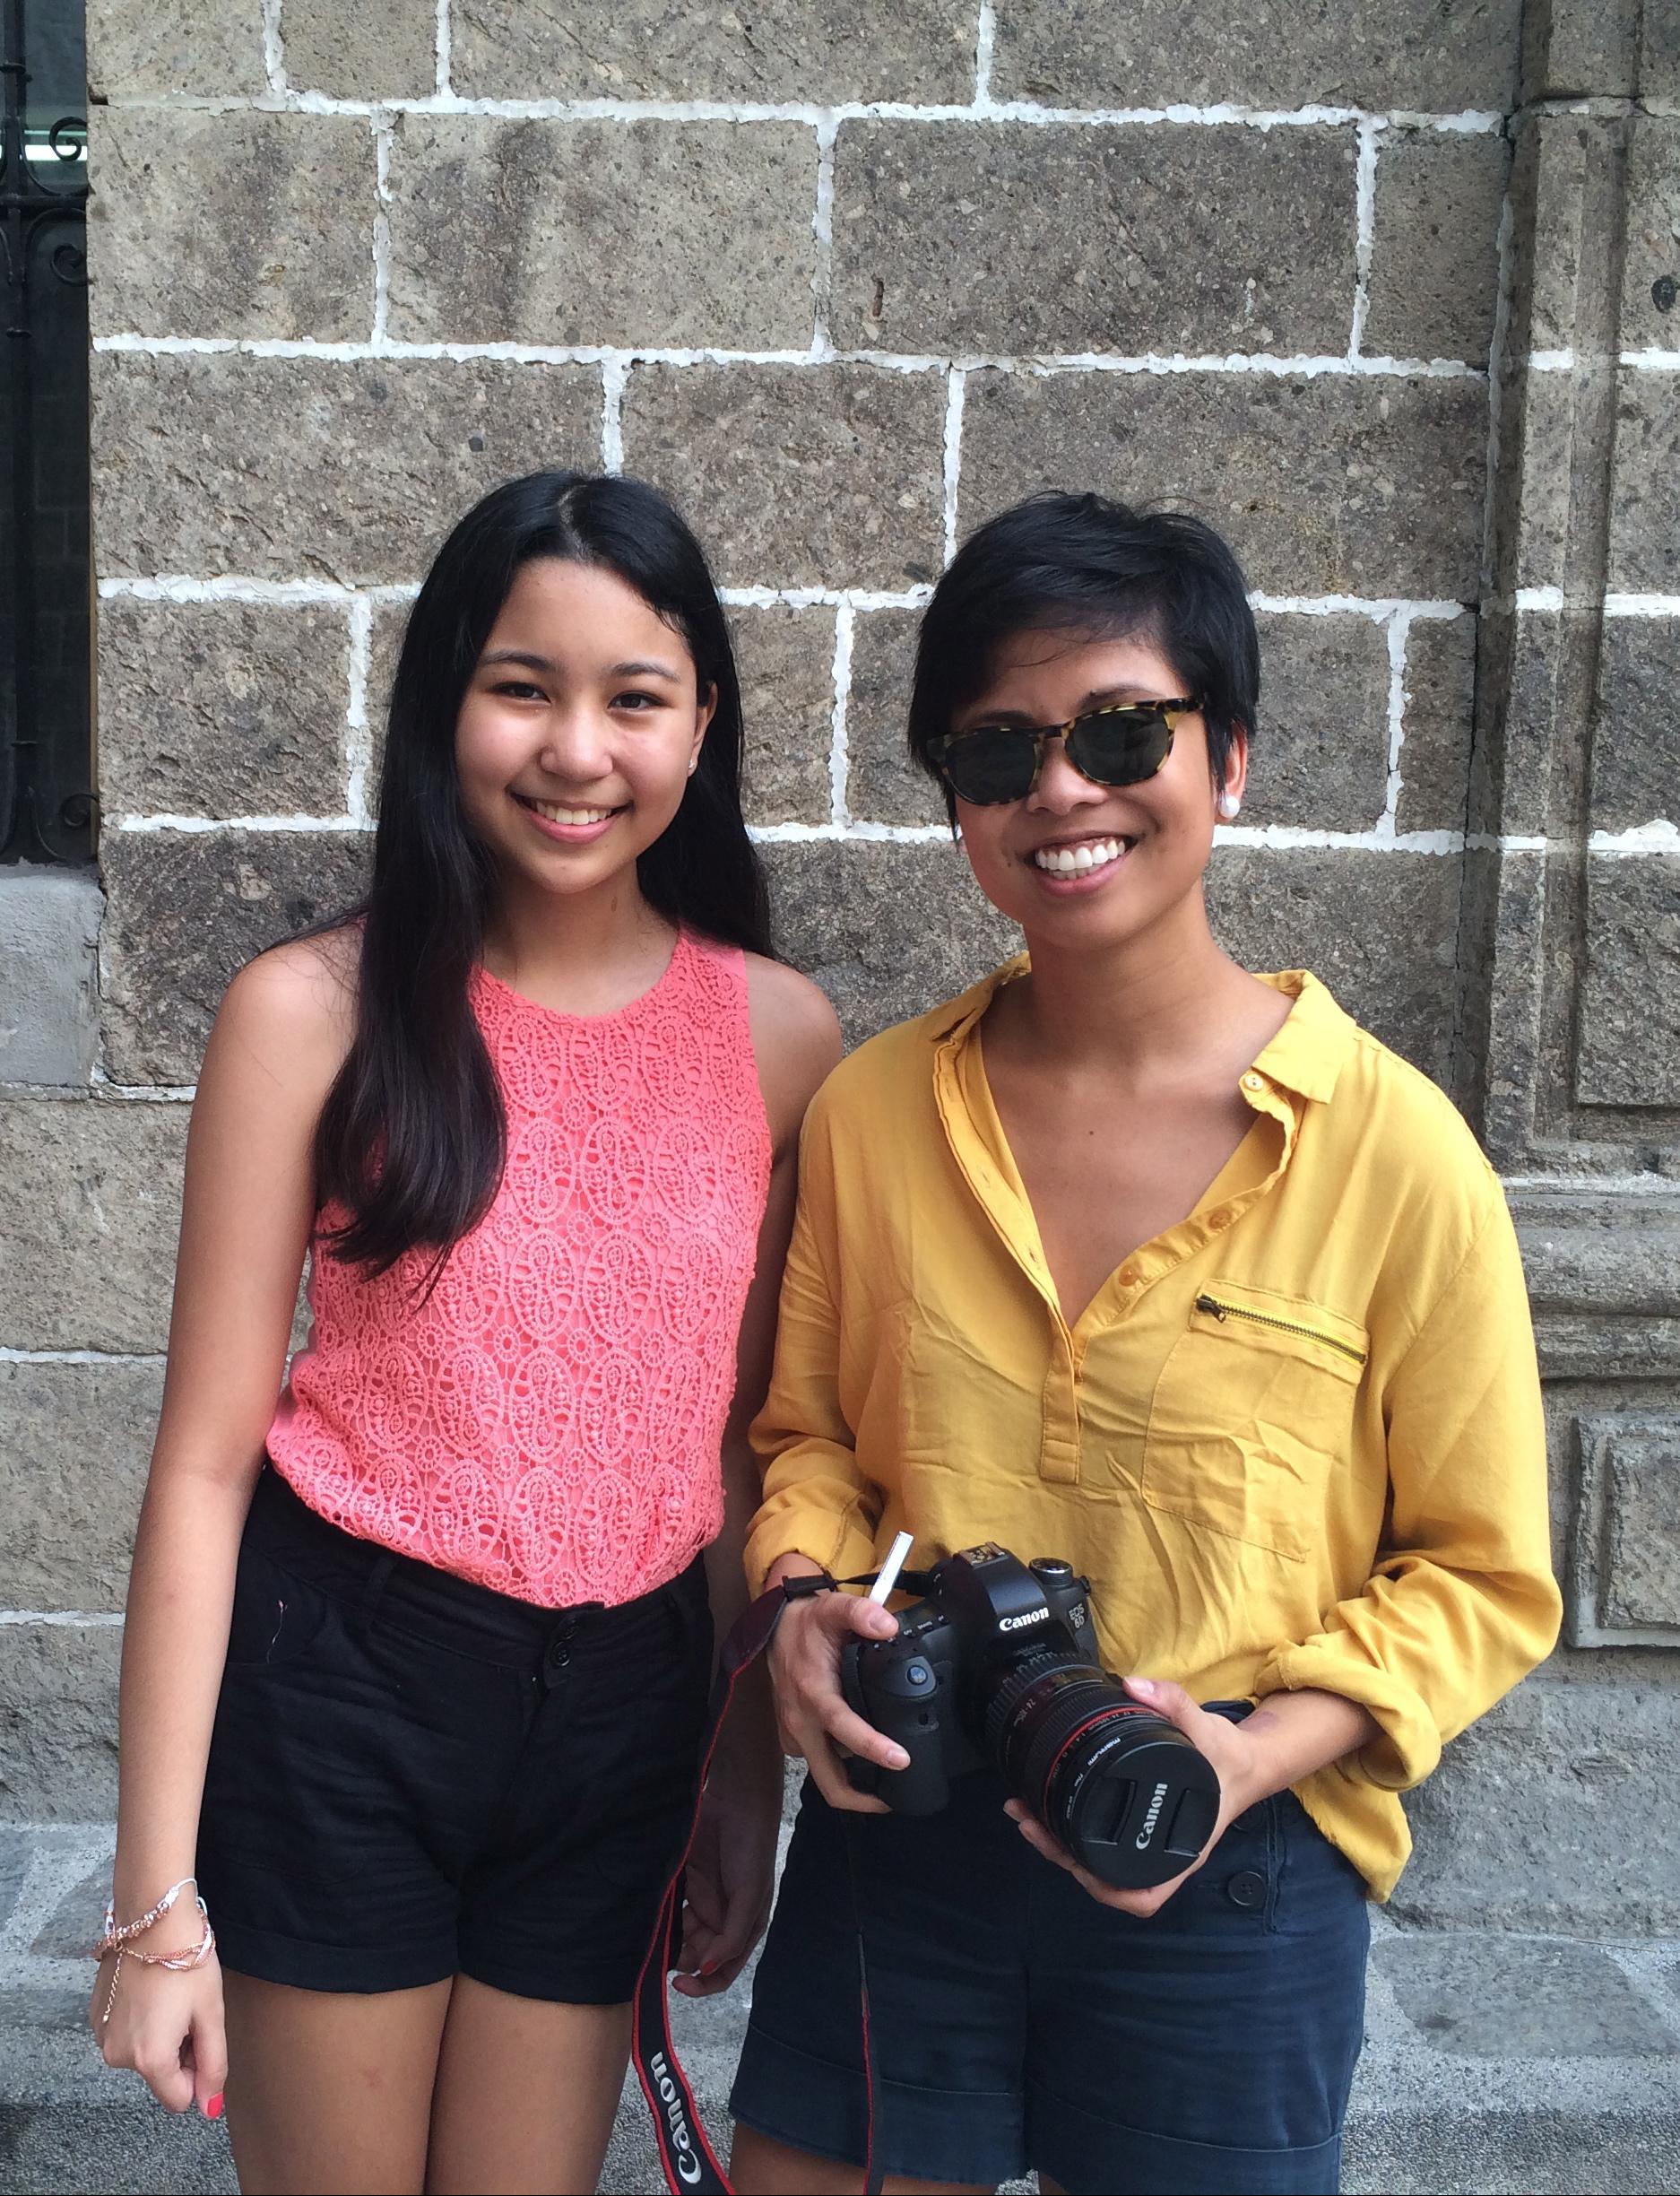 Pulse.ph intern Cheska Bernabe poses with Founder Rovaira Dasig.